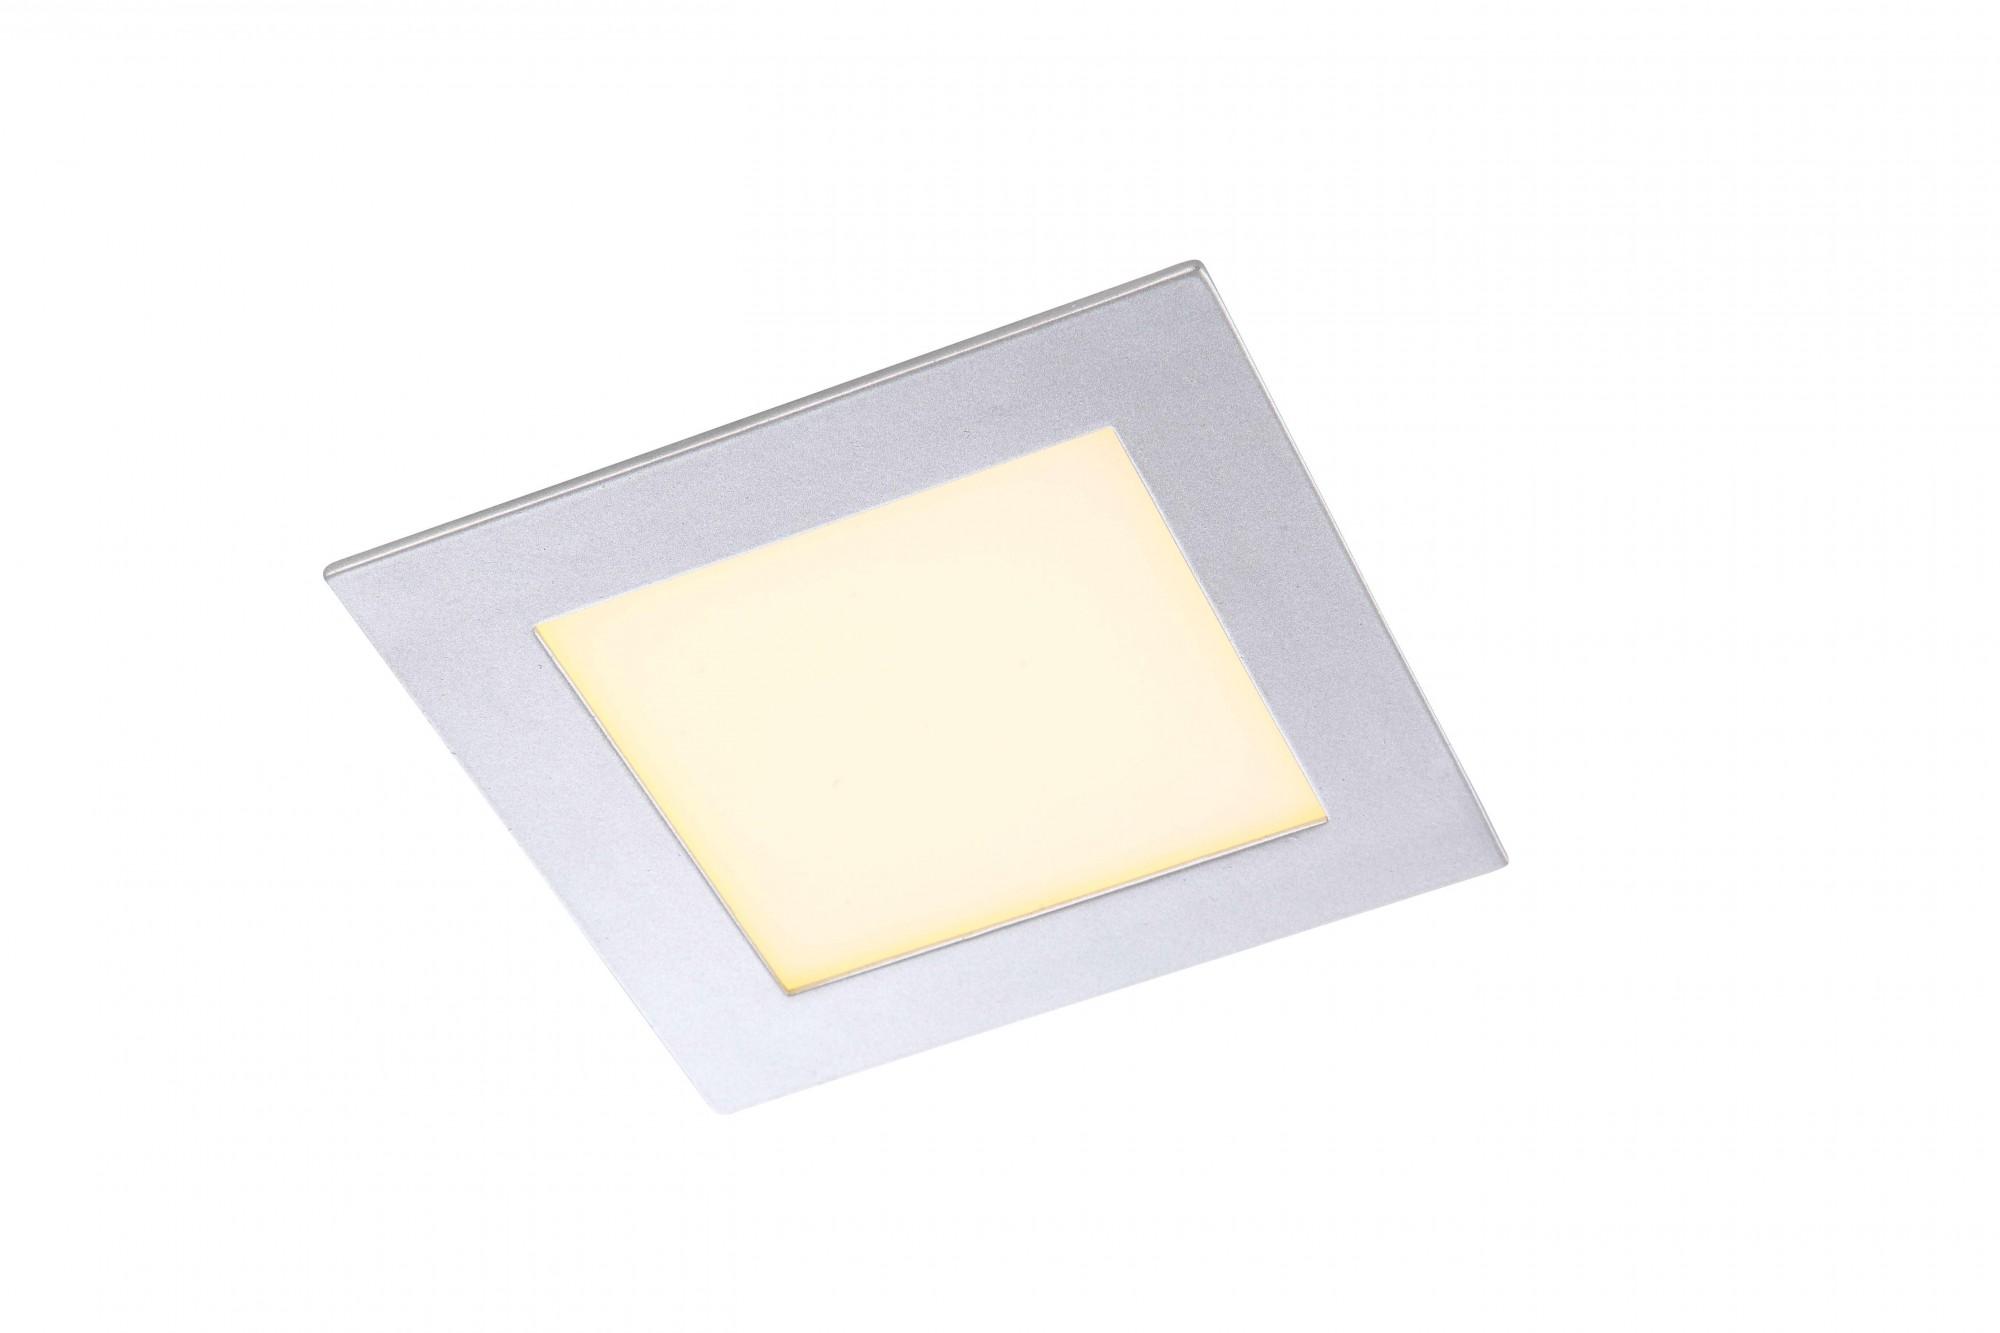 Фото товара A7412PL-1GY Arte Lamp